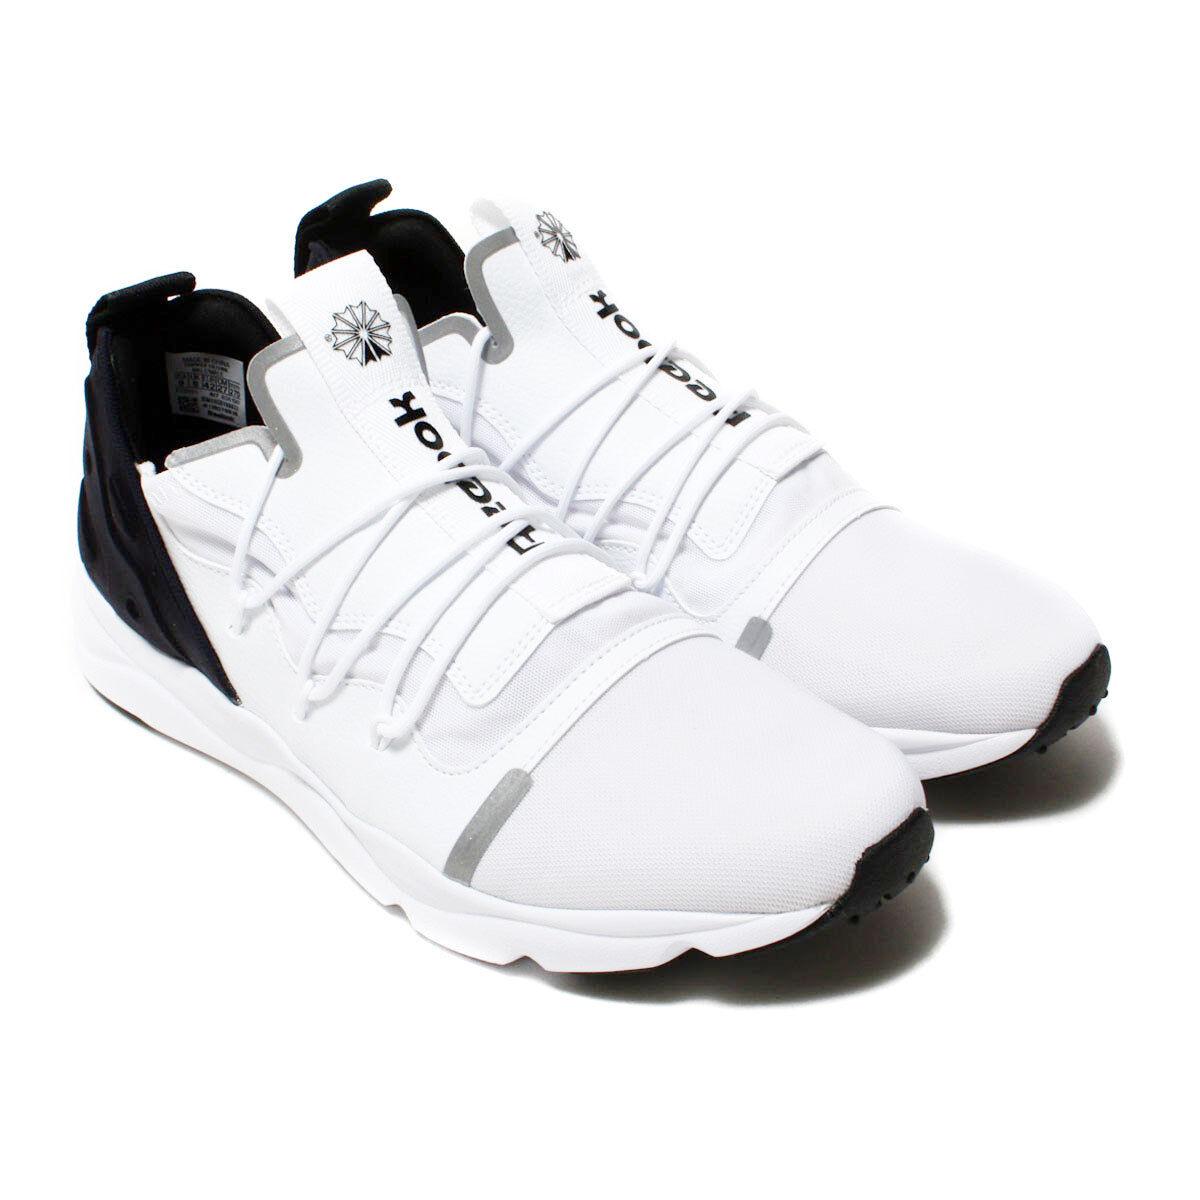 REEBOK FURYLITE x men Basket nouveau Blanc bs6190 gr:41 Original Blanc Chaussure Classic